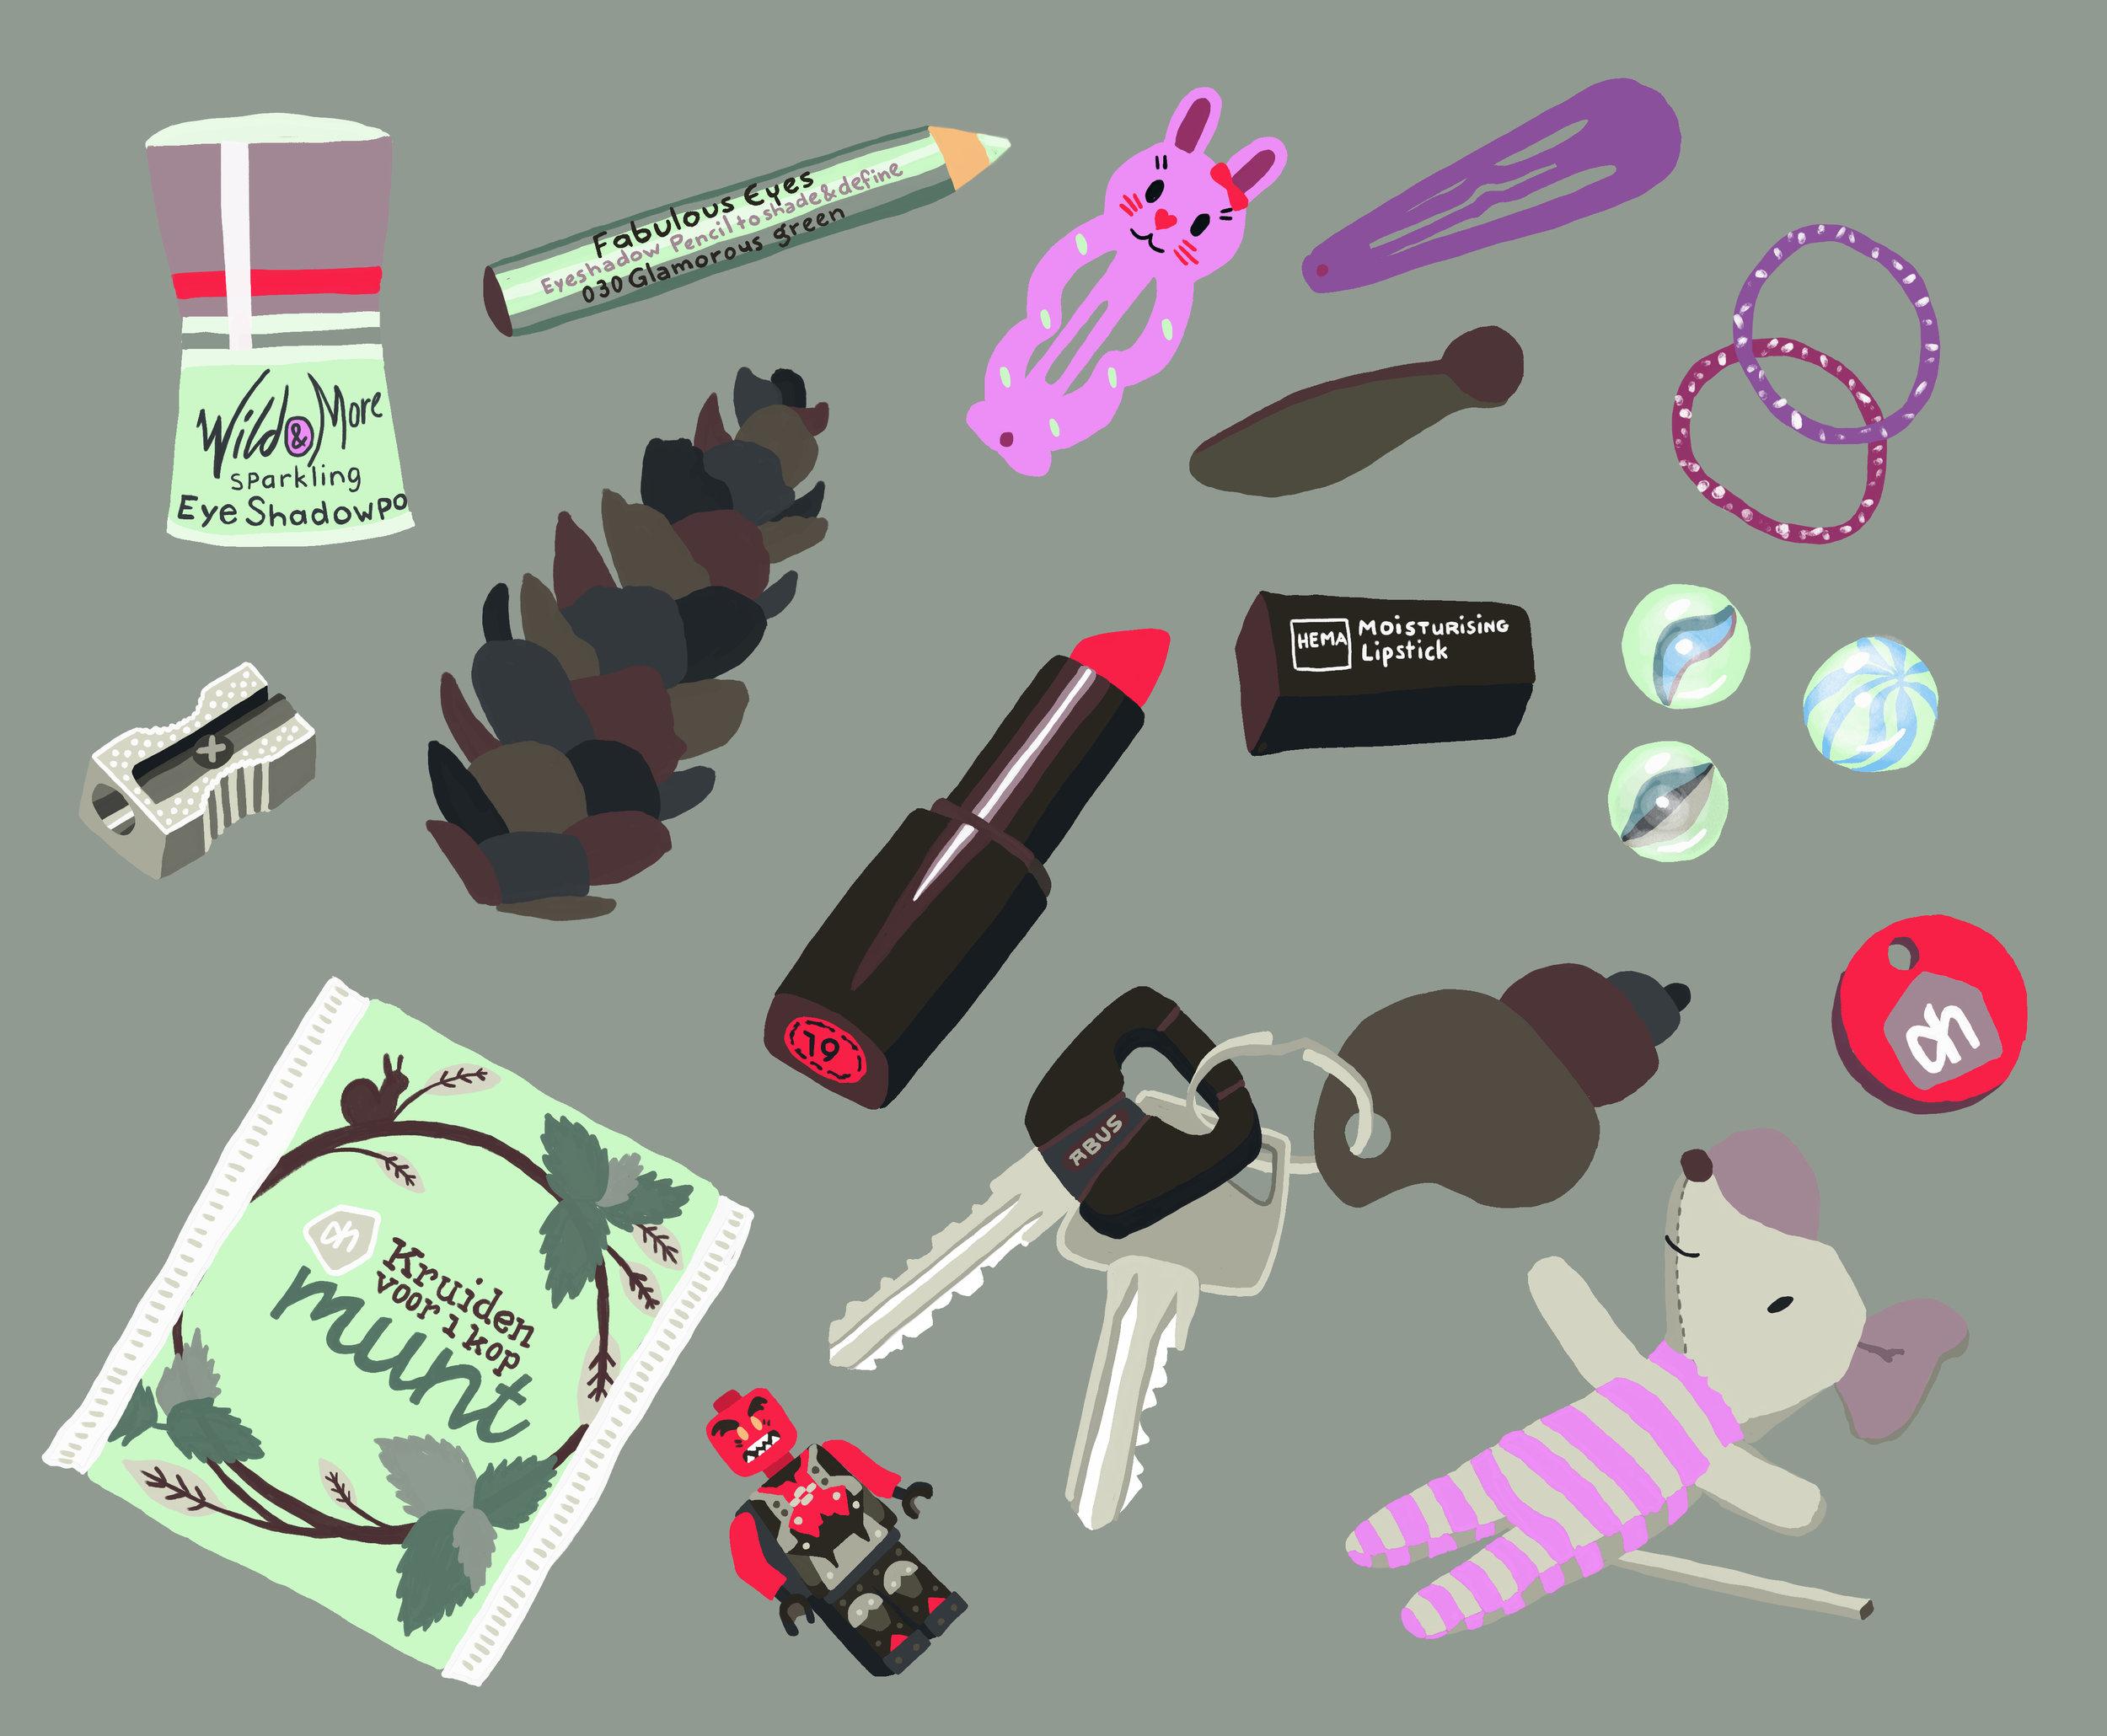 Stuff_in_my_bag_HI.jpg